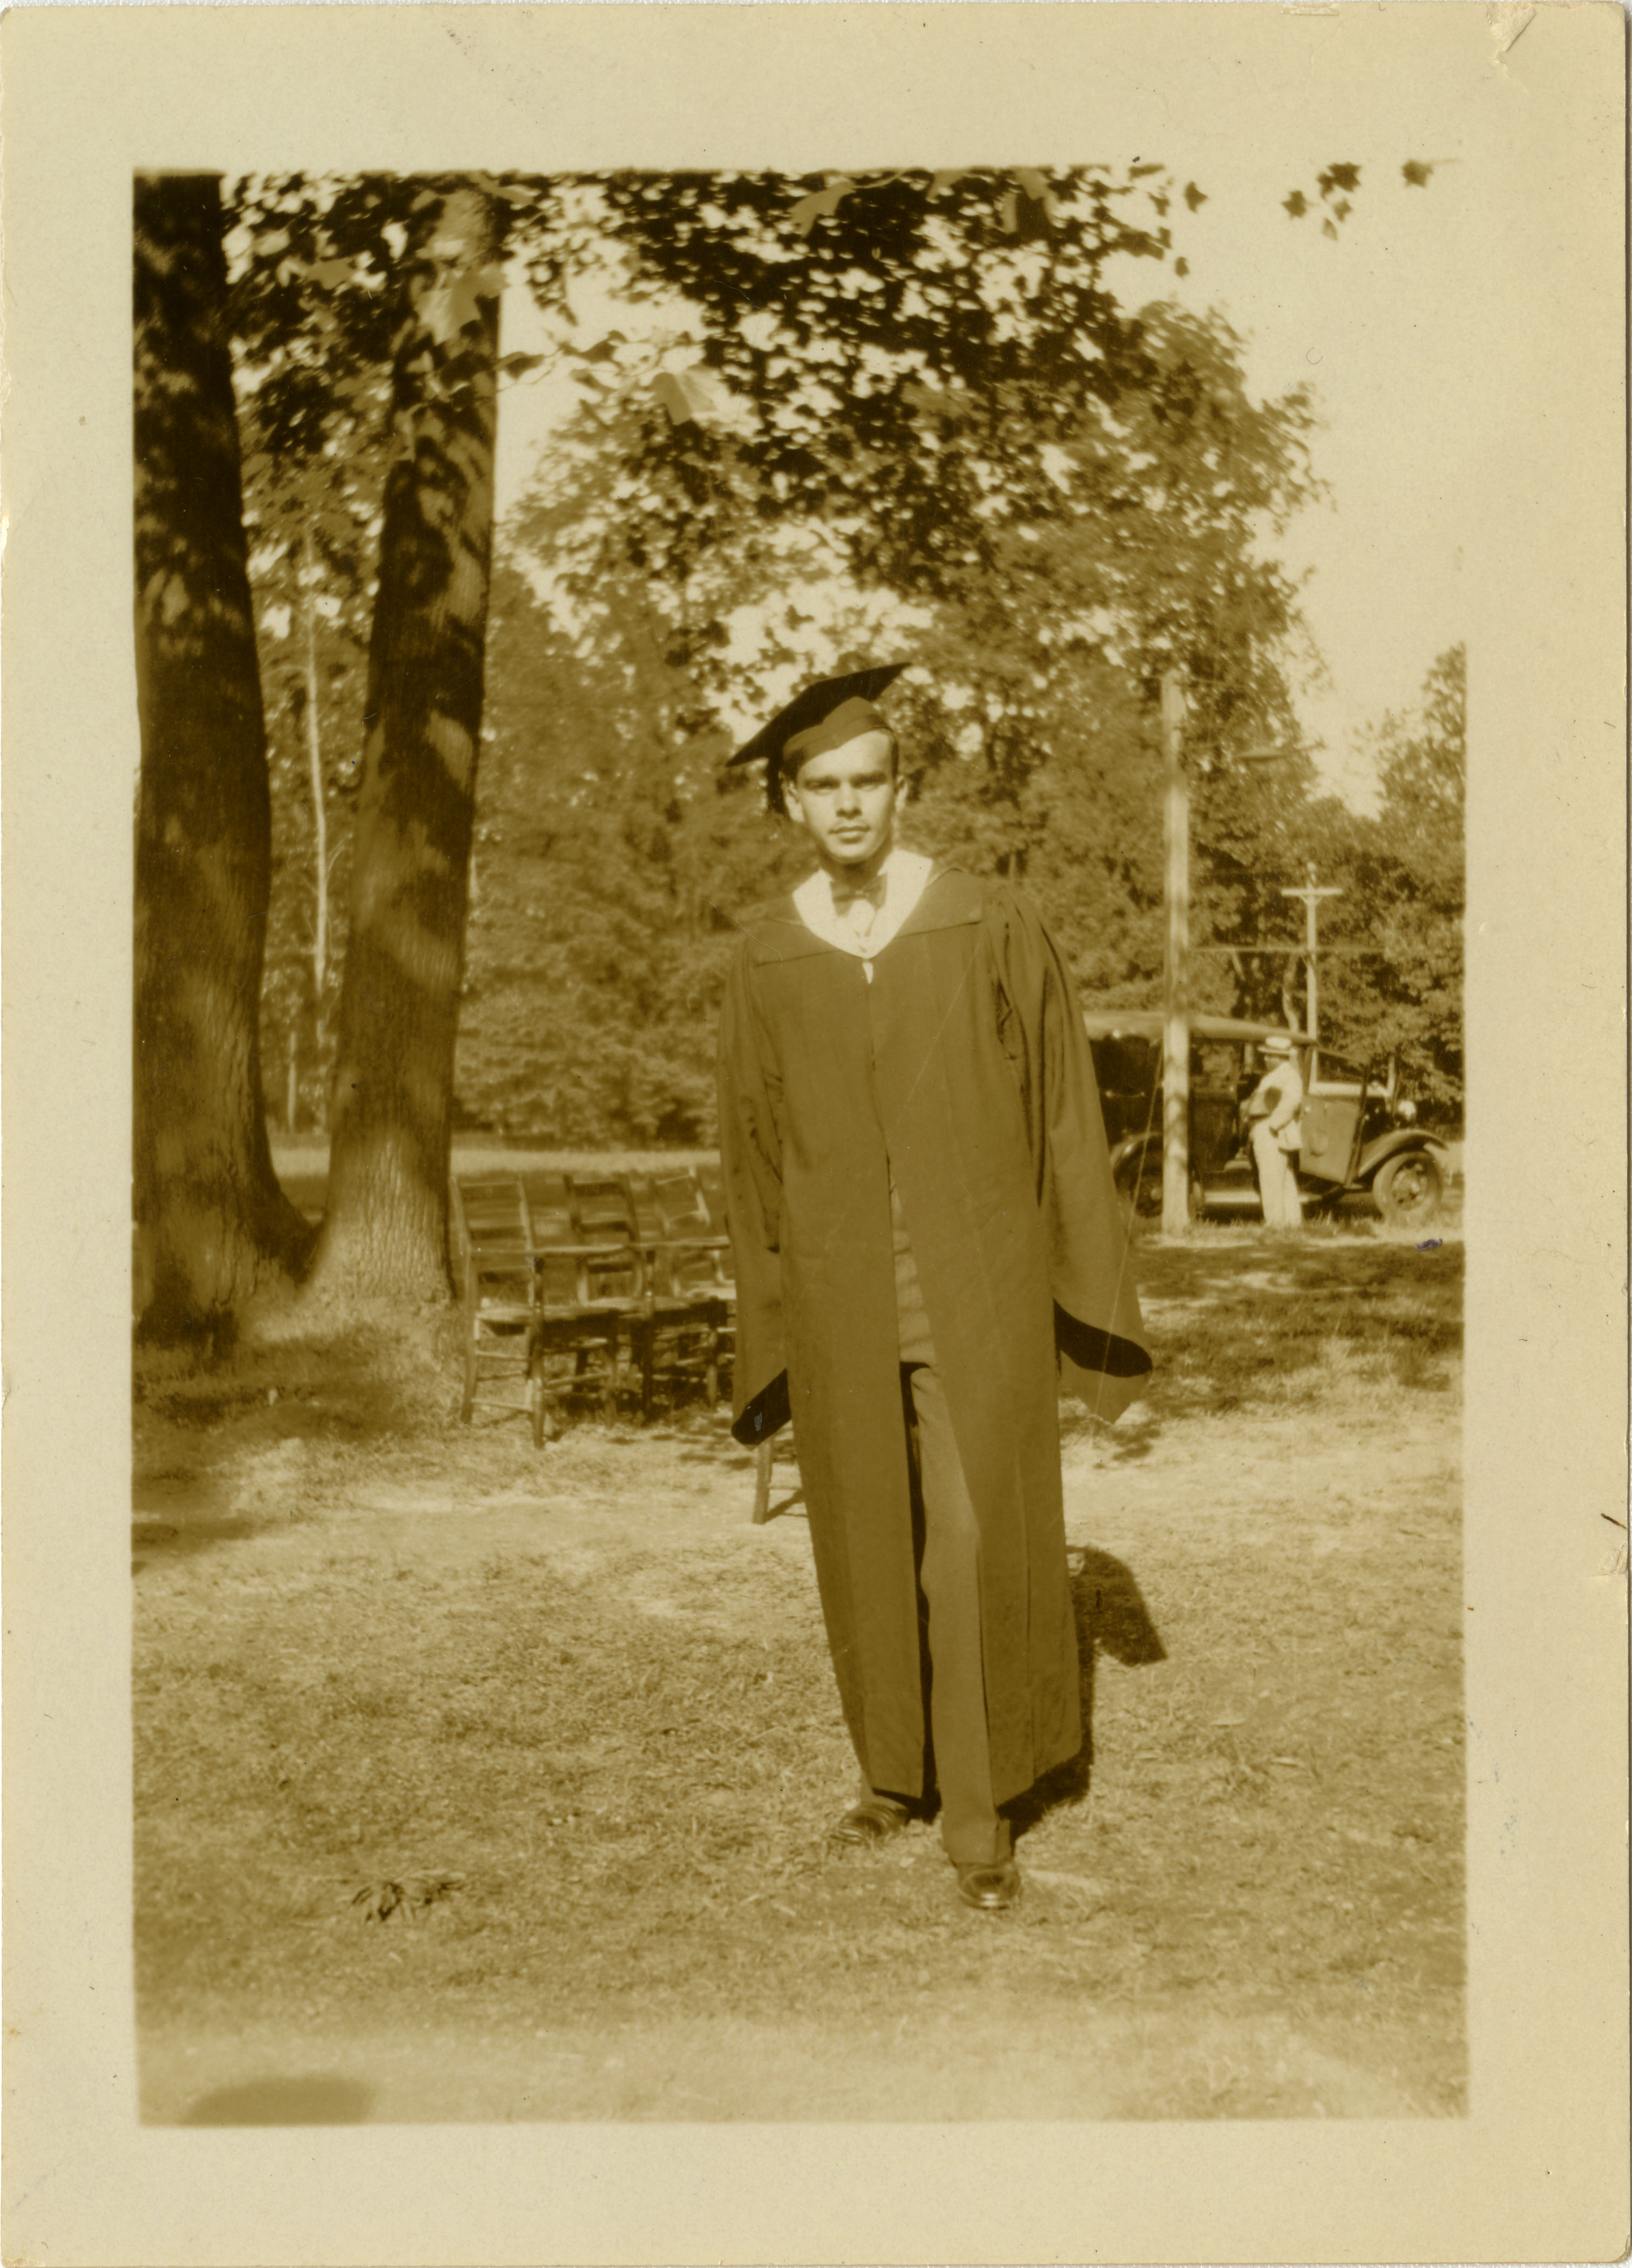 Graduation photograph of Frank A. DeCosta